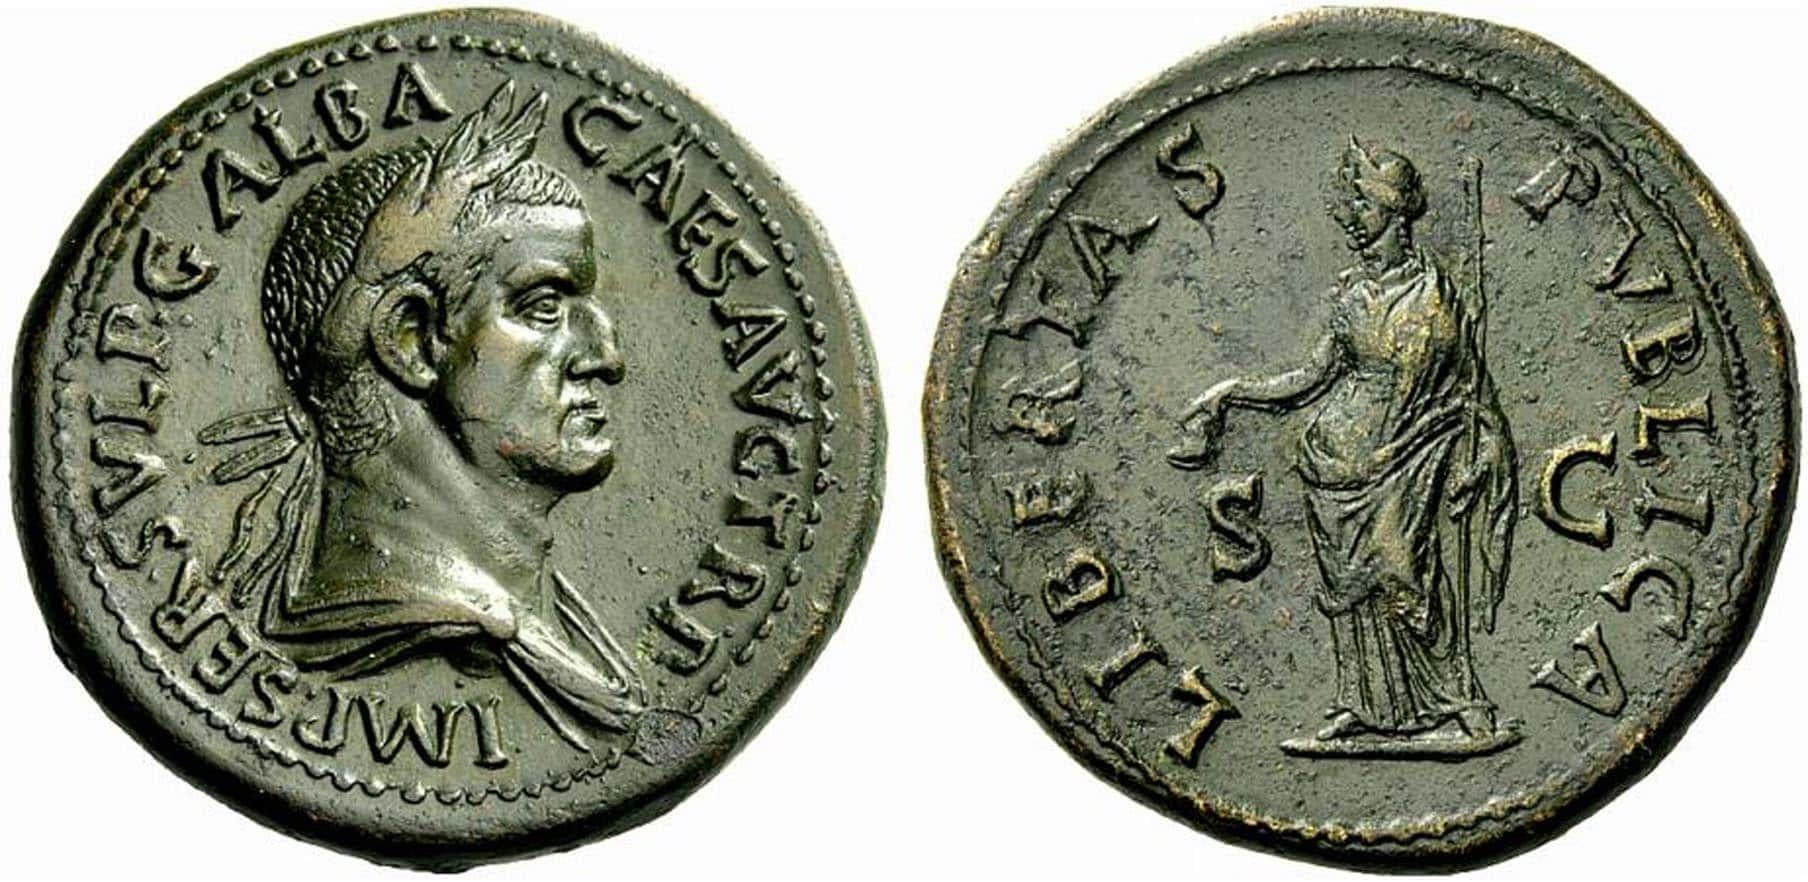 Nero facts